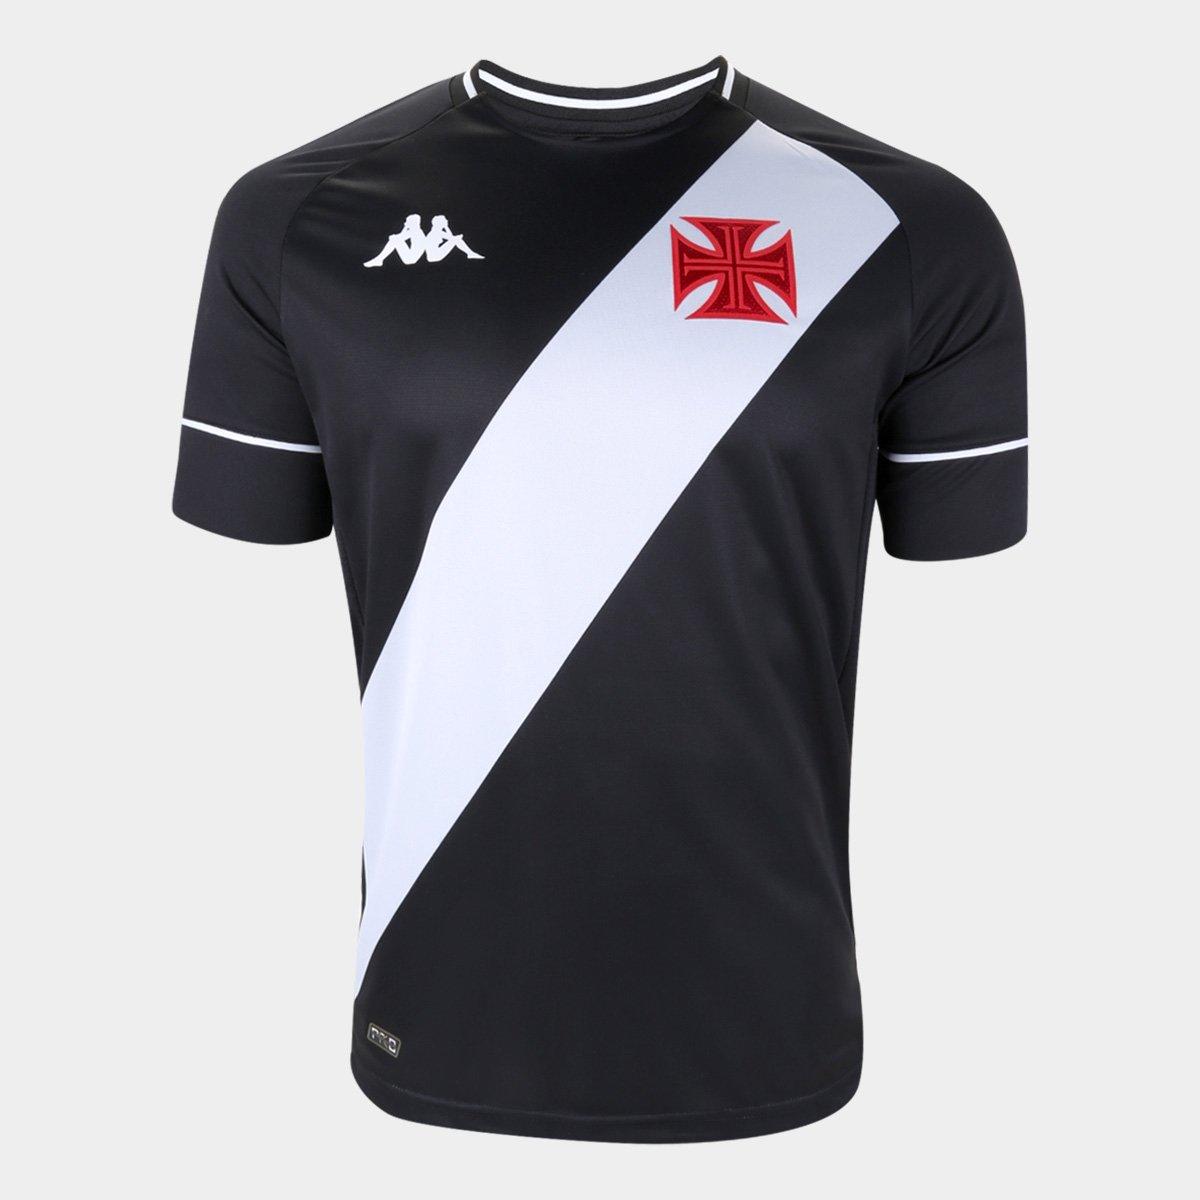 Camisa Vasco I Kappa 2020/2021 - Talles Magno